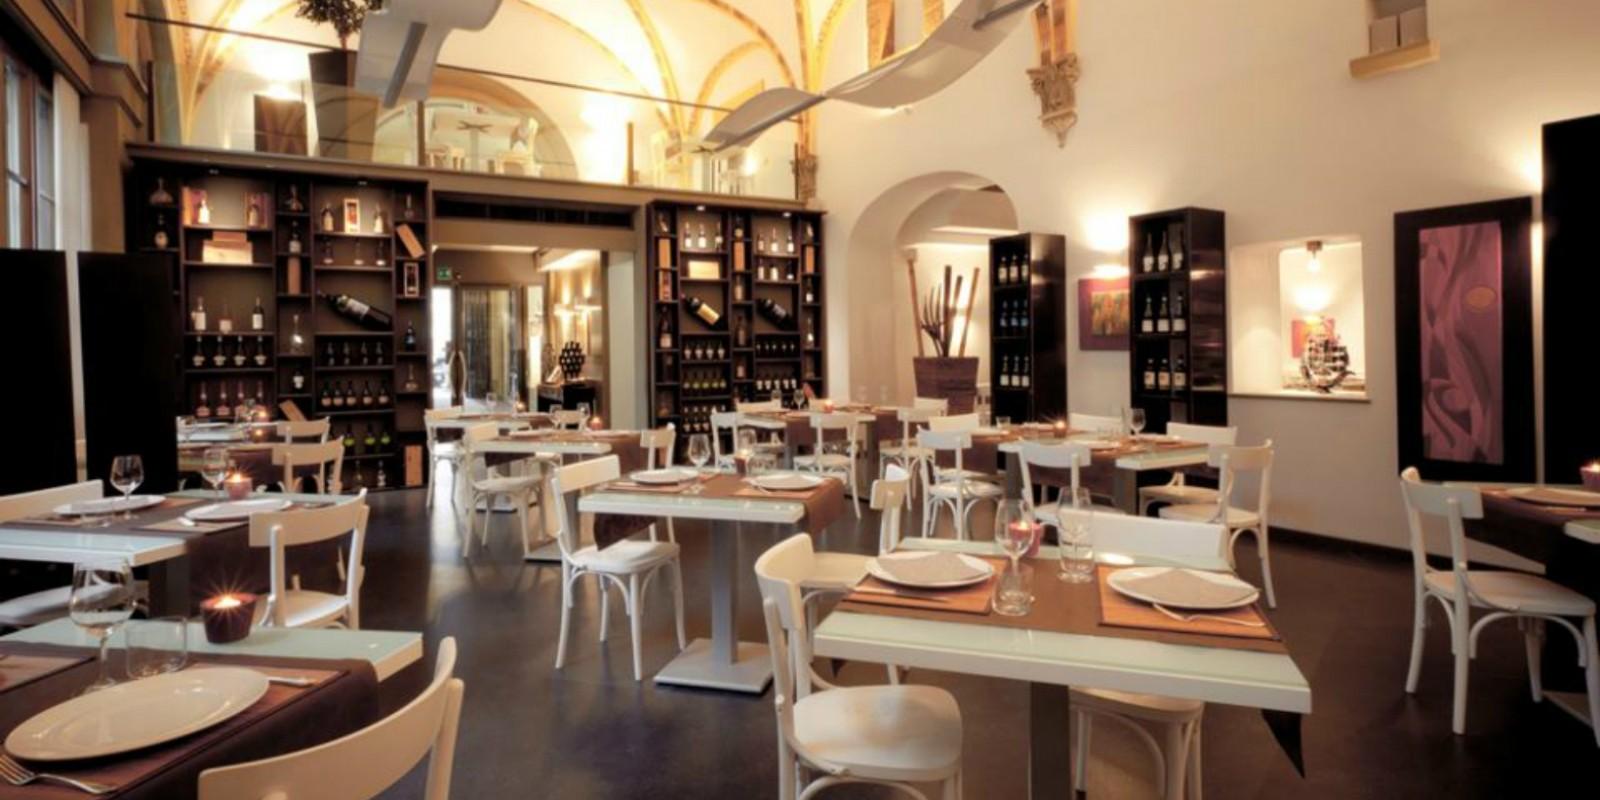 I migliori ristoranti di pesce a firenze dove andare - Centro cucina firenze ...